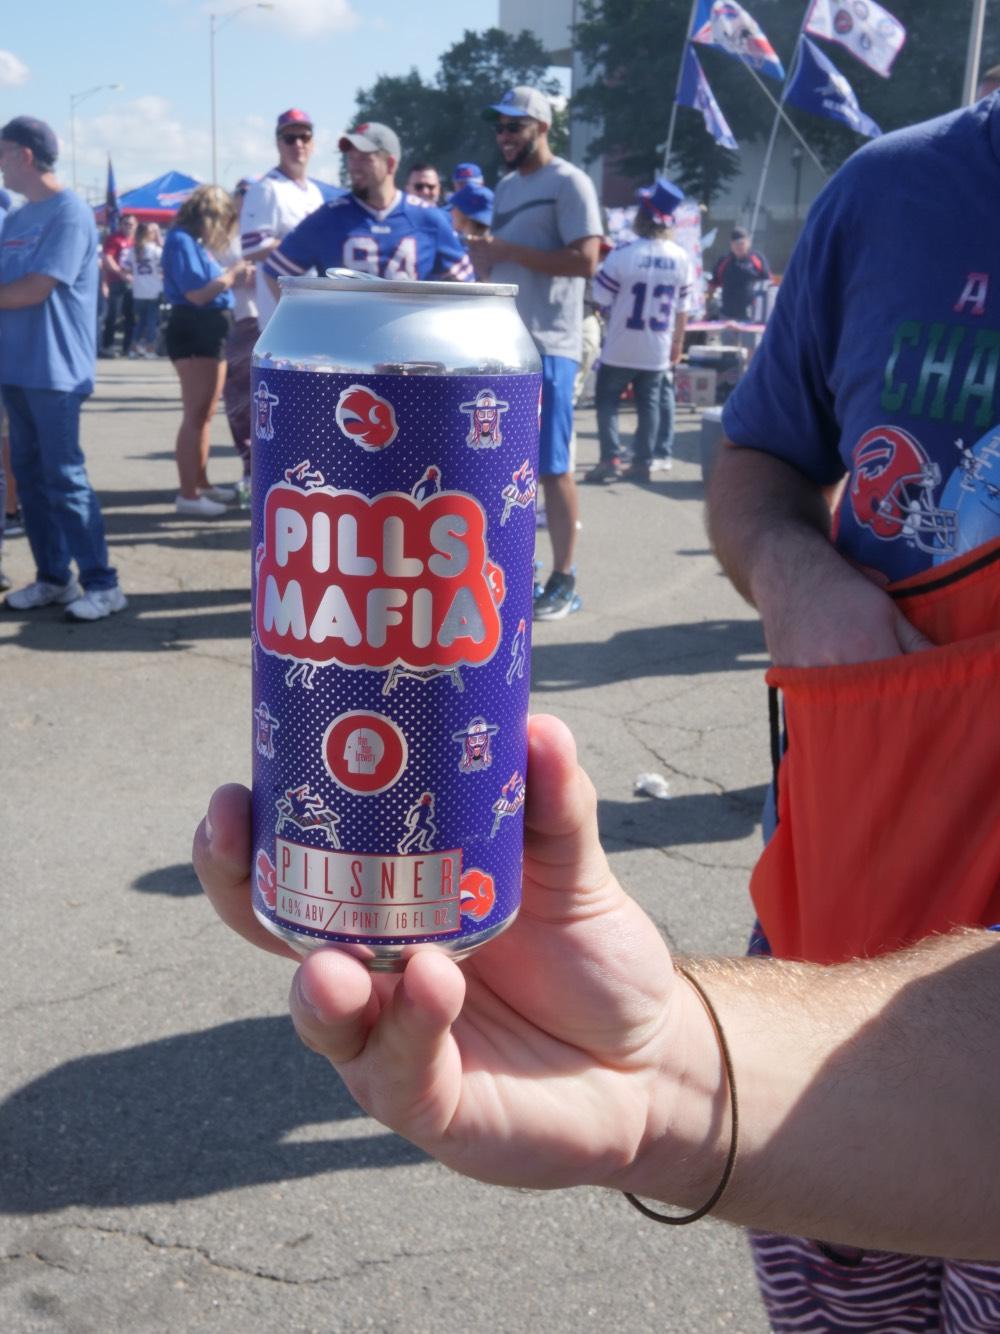 Pills Mafia beer